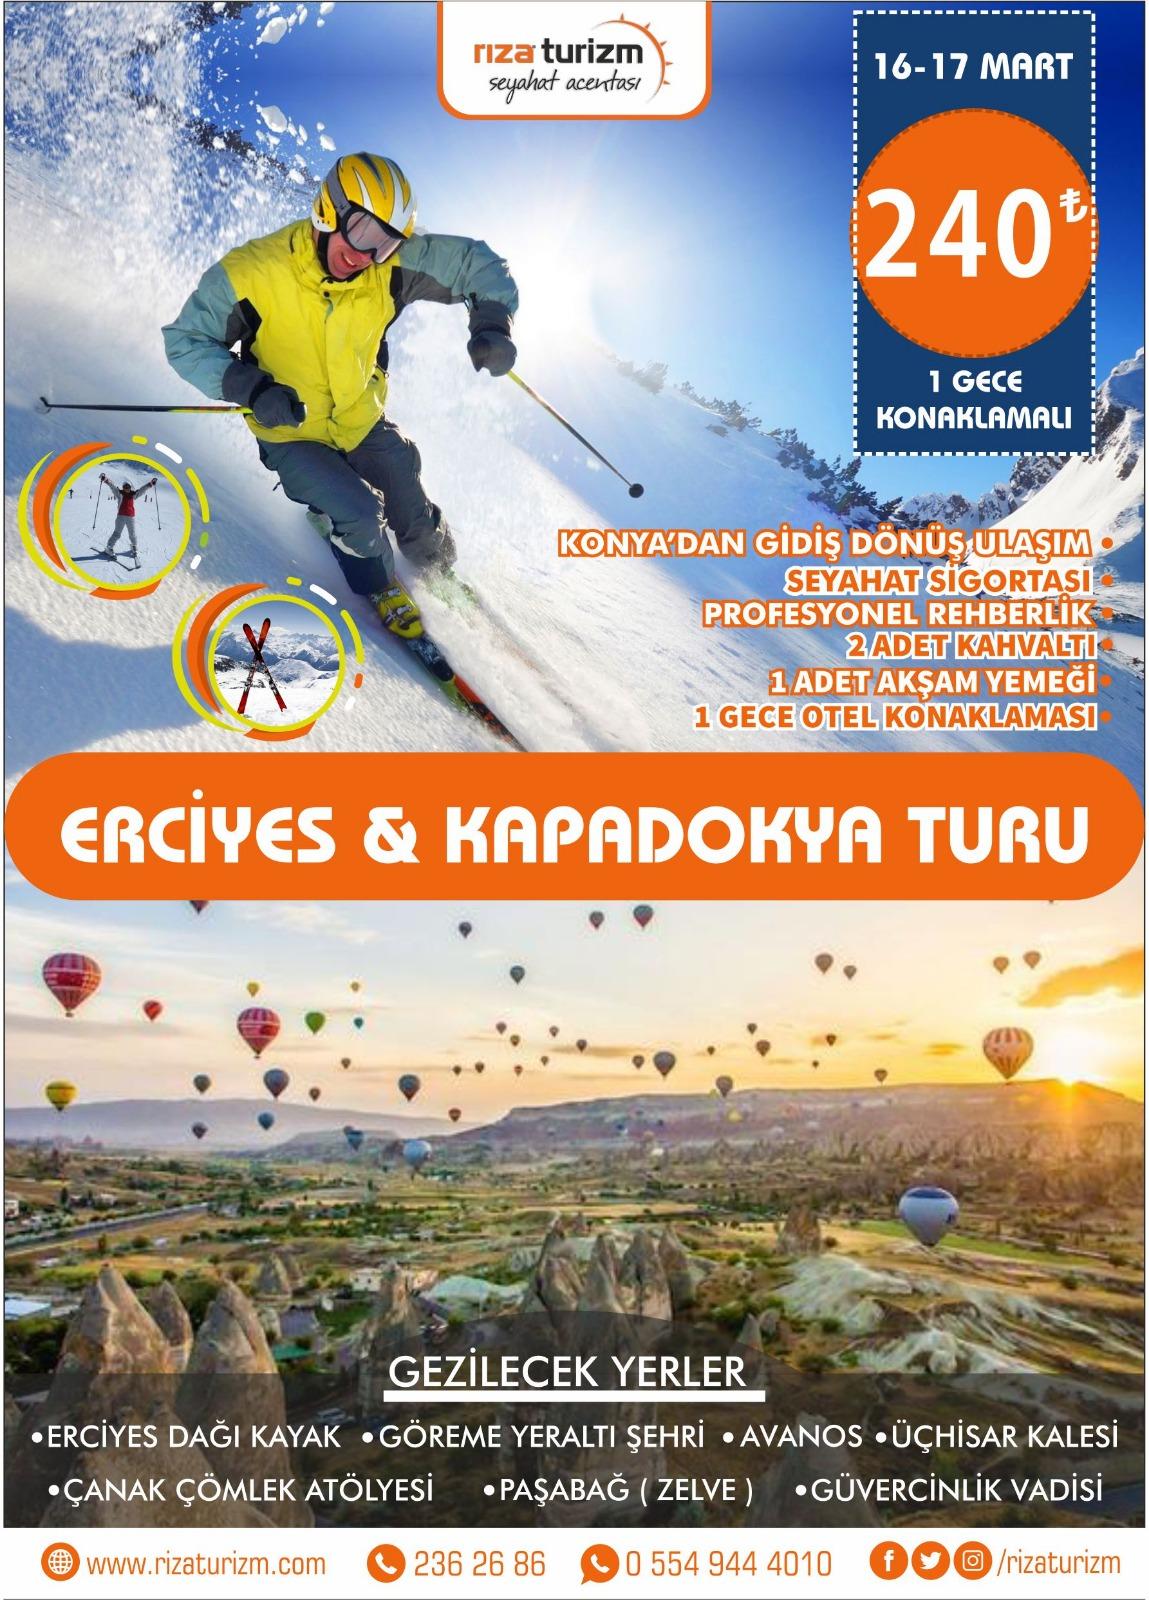 Erciyes Kapadokya Turu